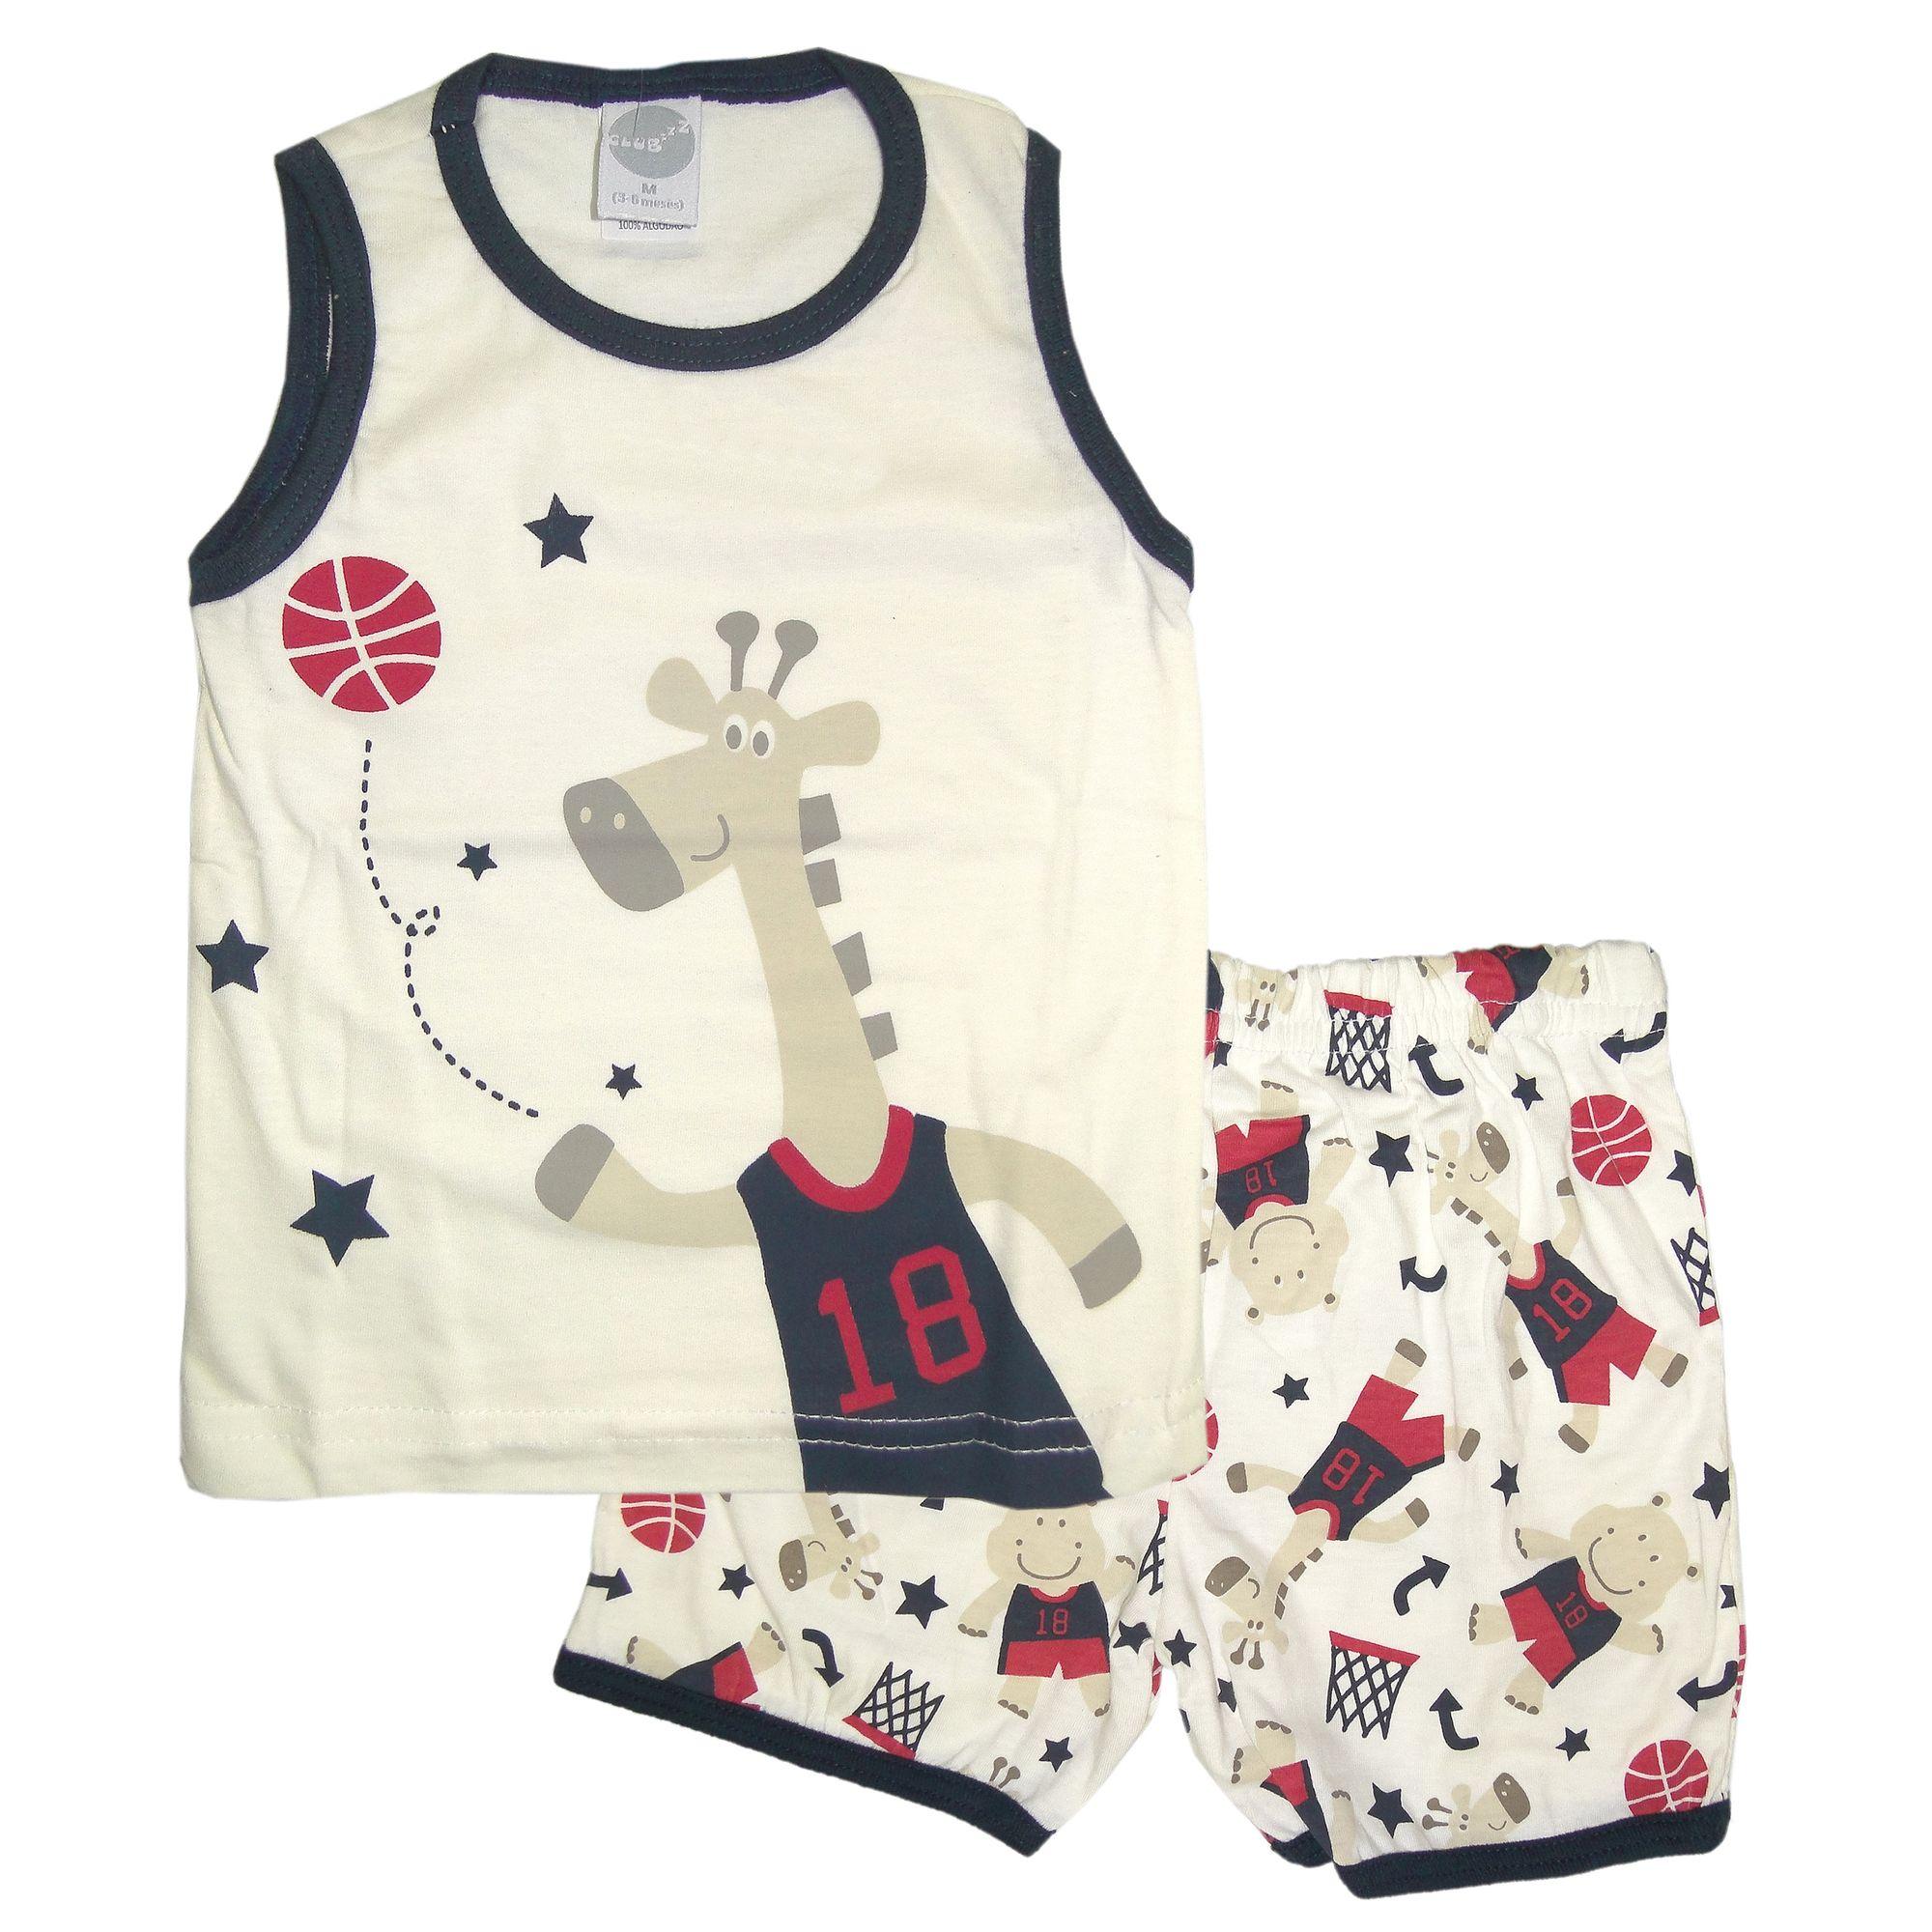 pijama-menino-girafa-basquete-piupiu-club-zzz